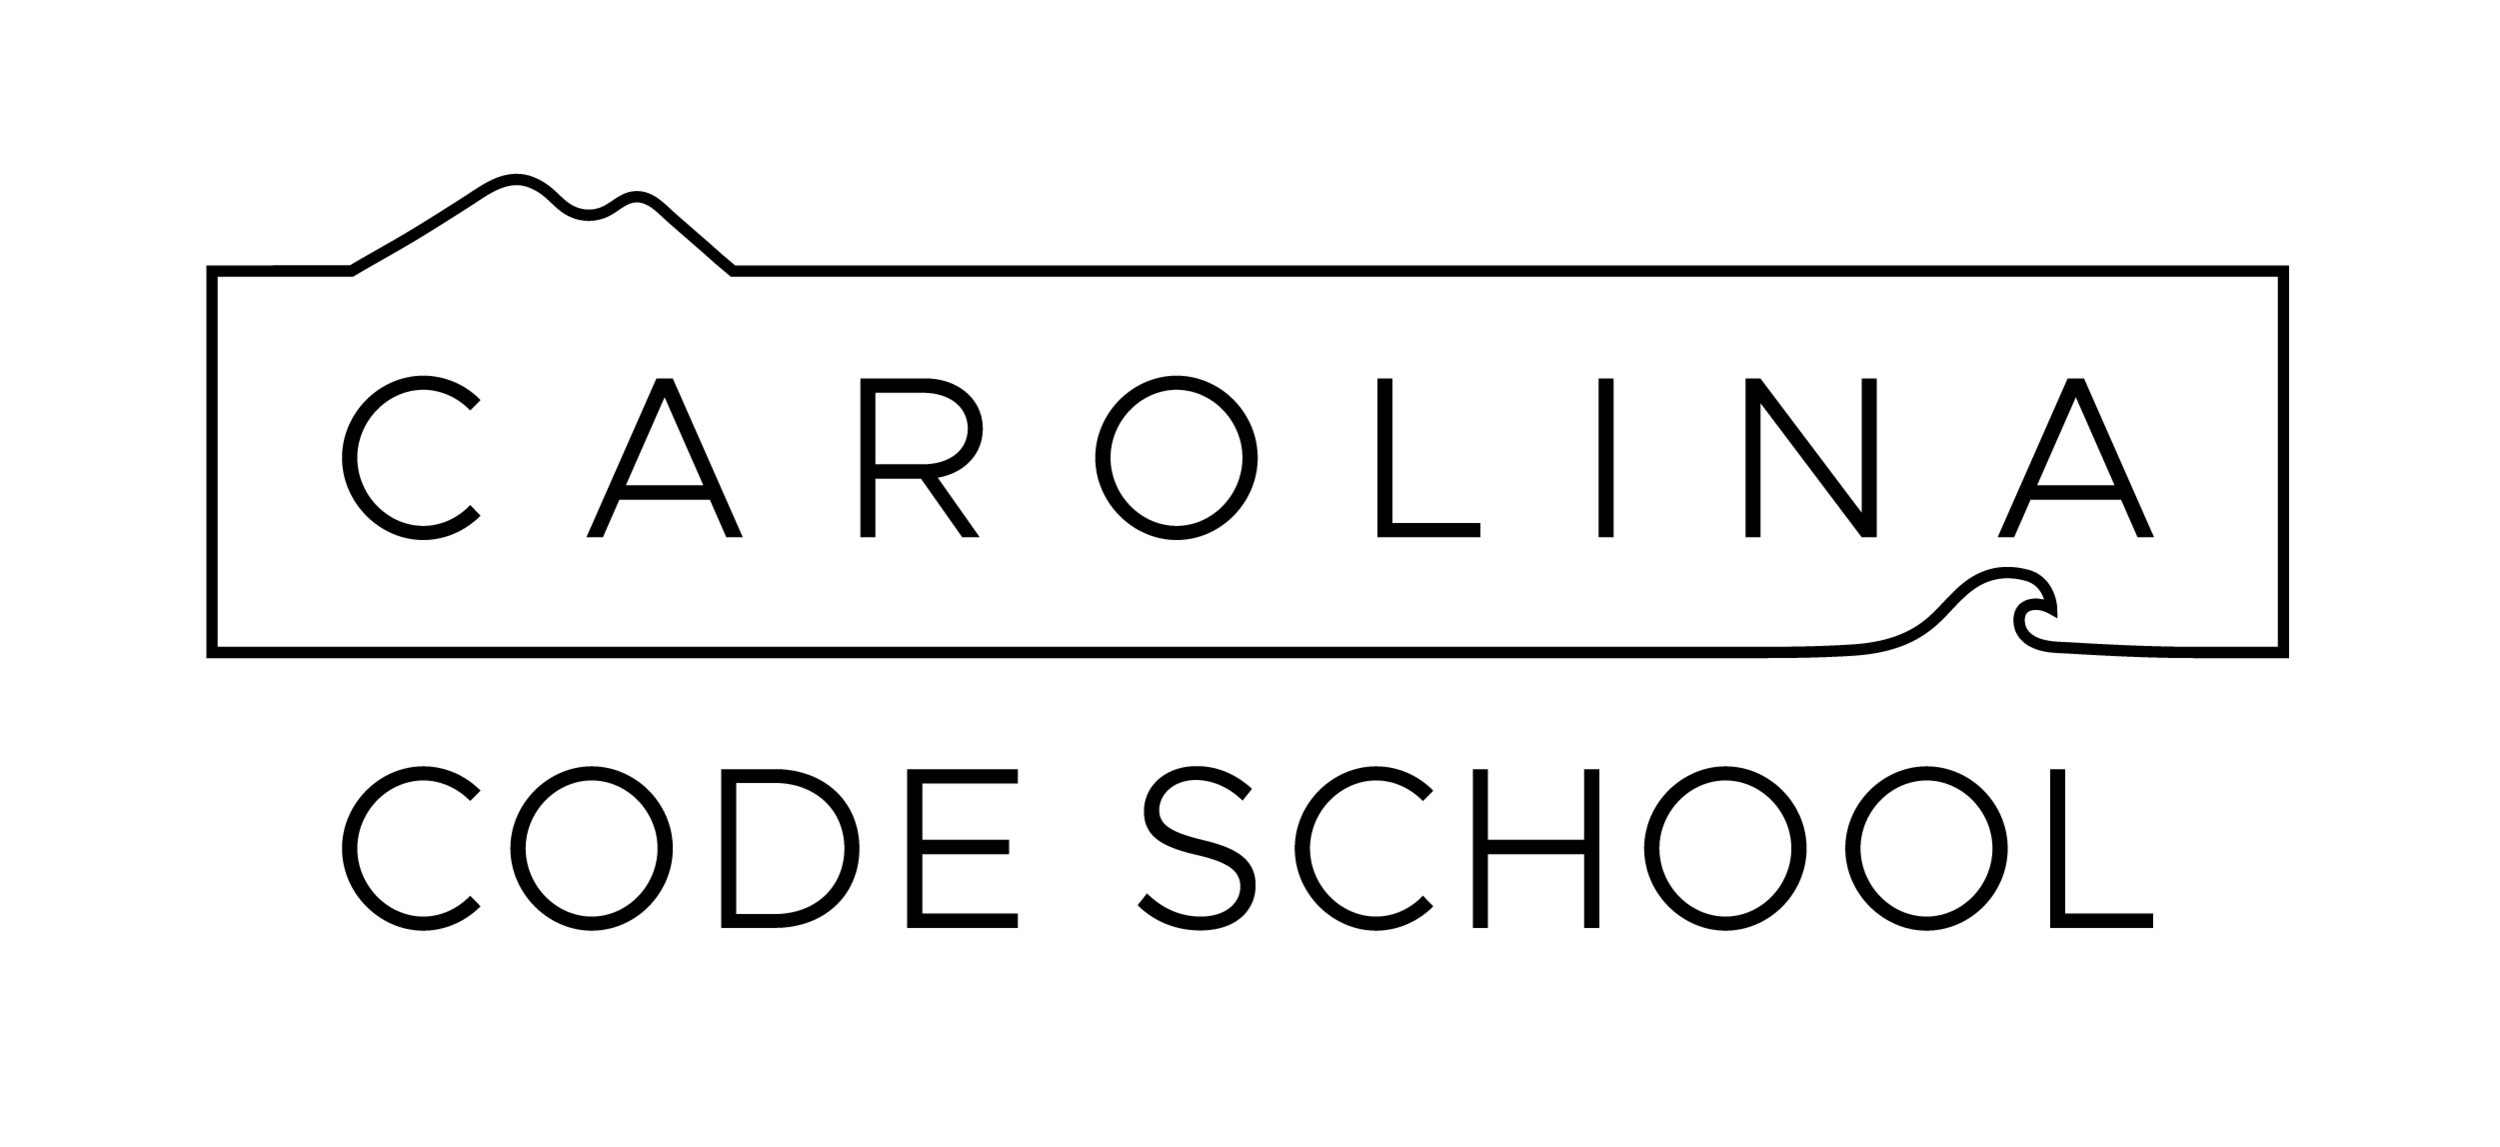 carolina_code_school_logo_500px.png